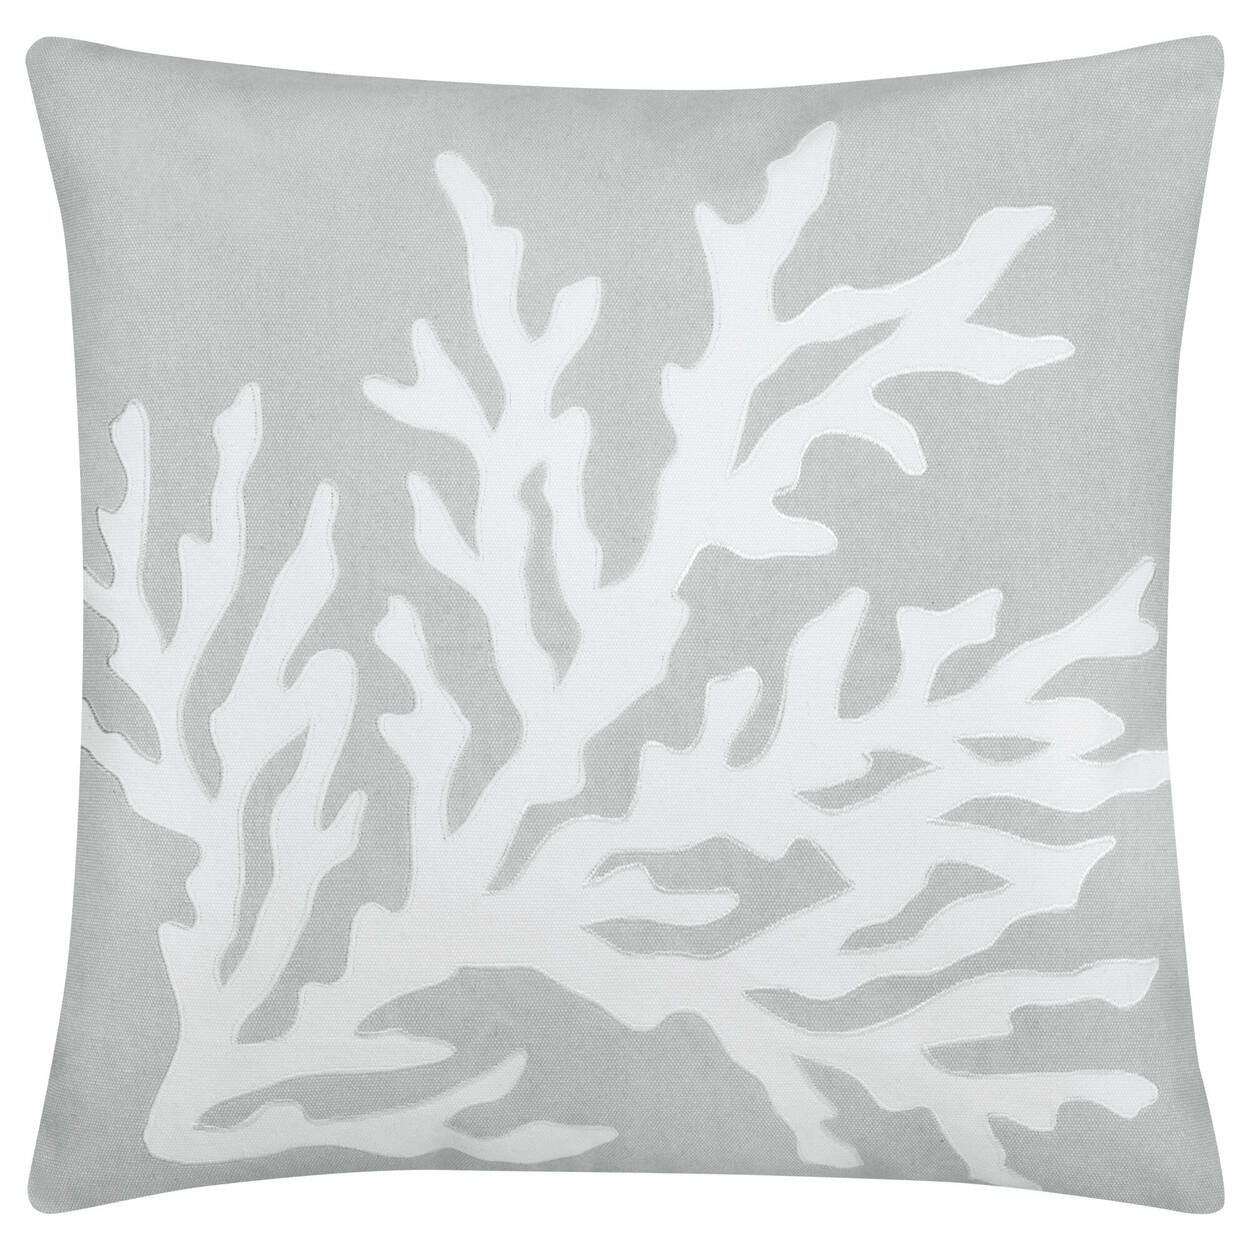 "Loana Decorative Pillow 19"" X 19"""